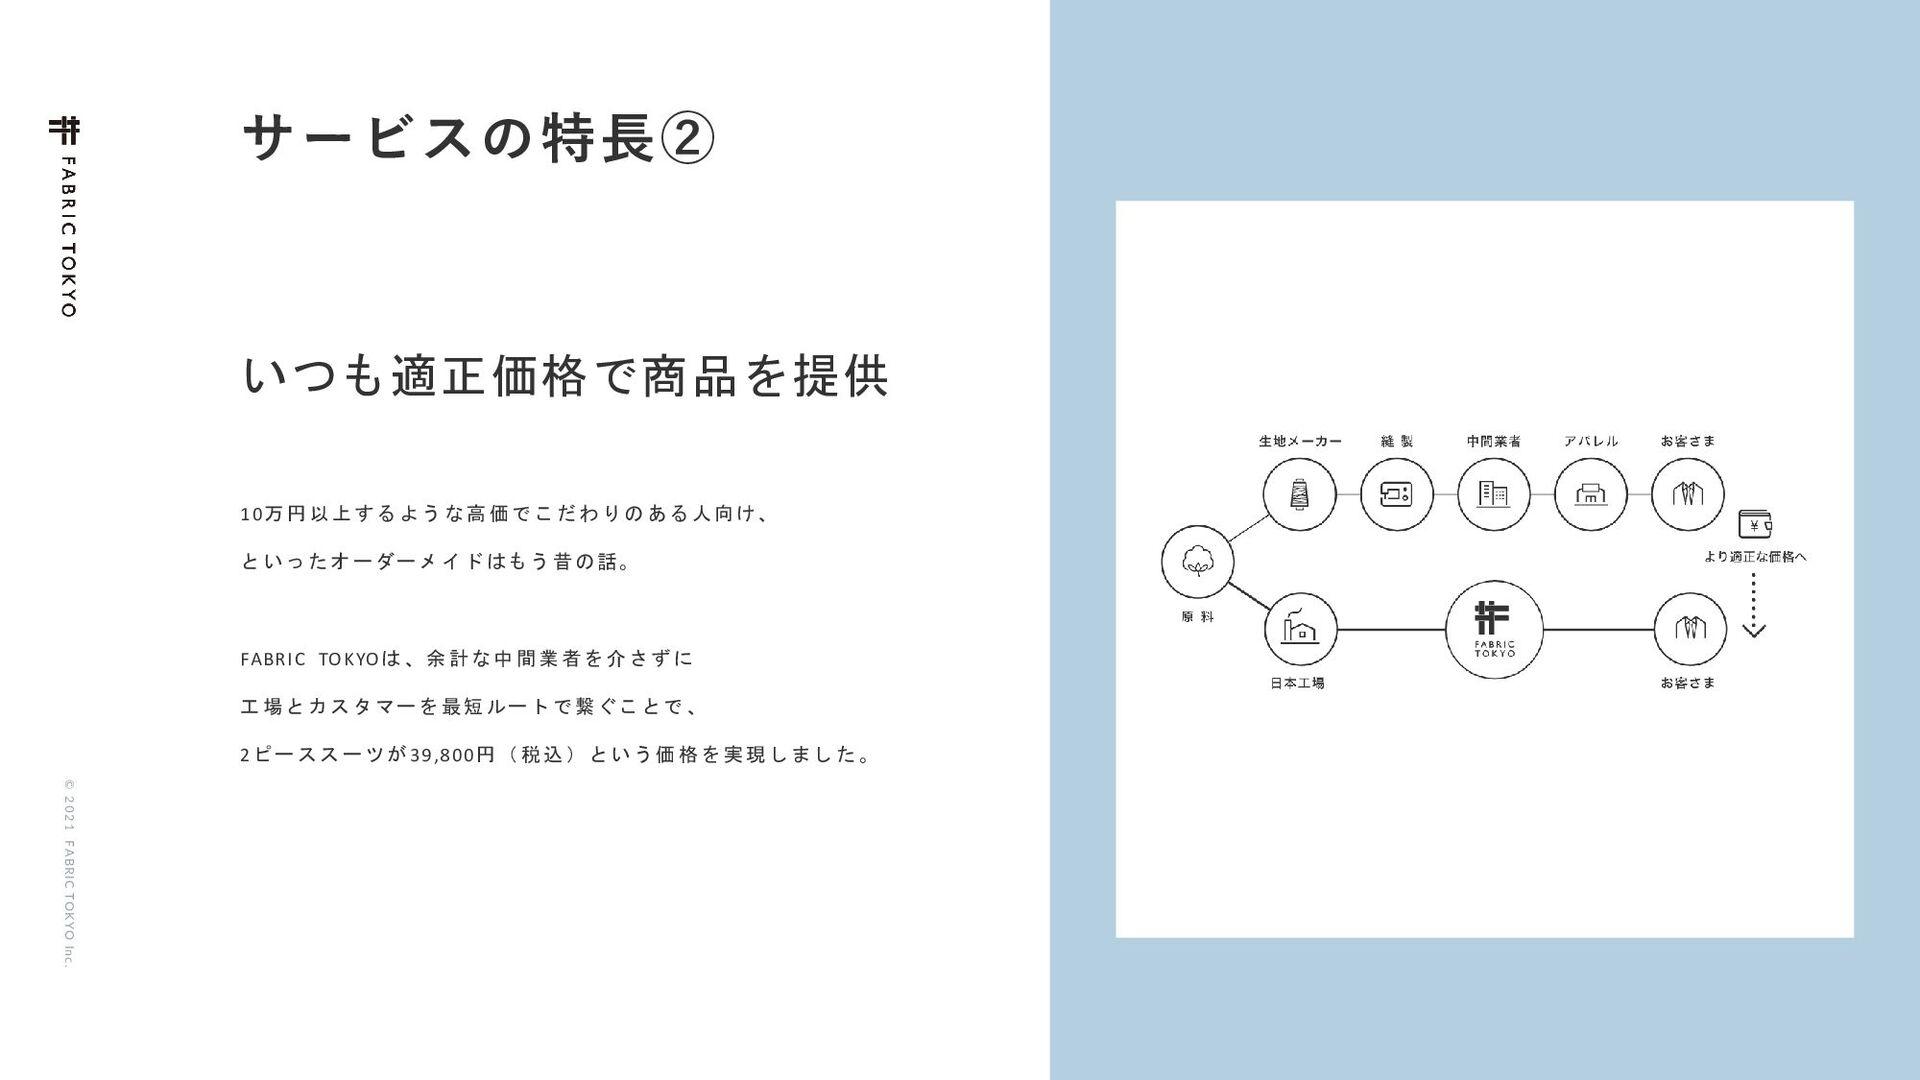 © 2021 FABRIC TOKYO Inc. 17 αʔϏεͷಛᶄ ͍ͭదਖ਼Ձ֨Ͱ...